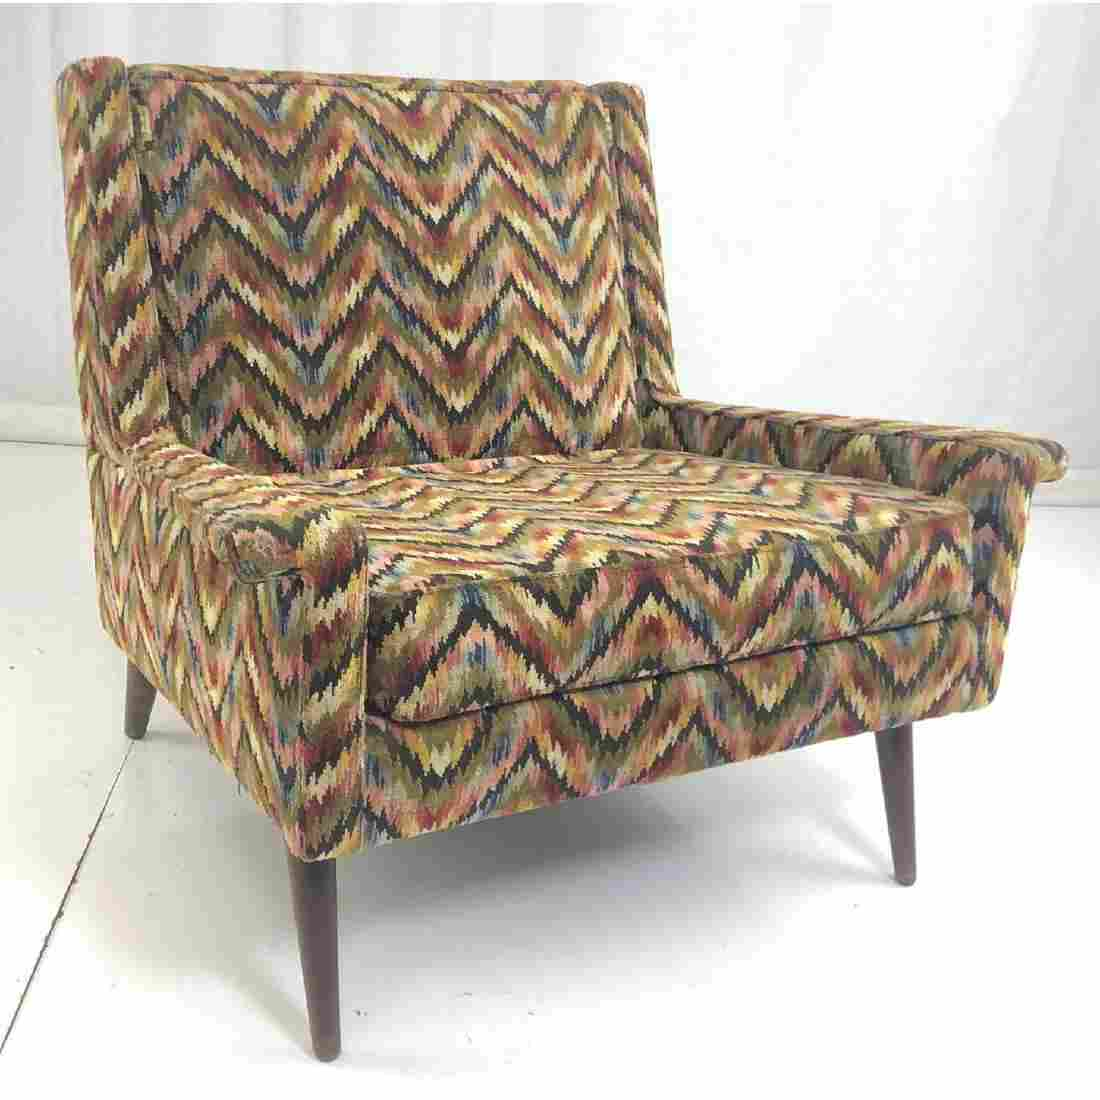 Modernist Paul McCobb style Lounge Chair. Flame s